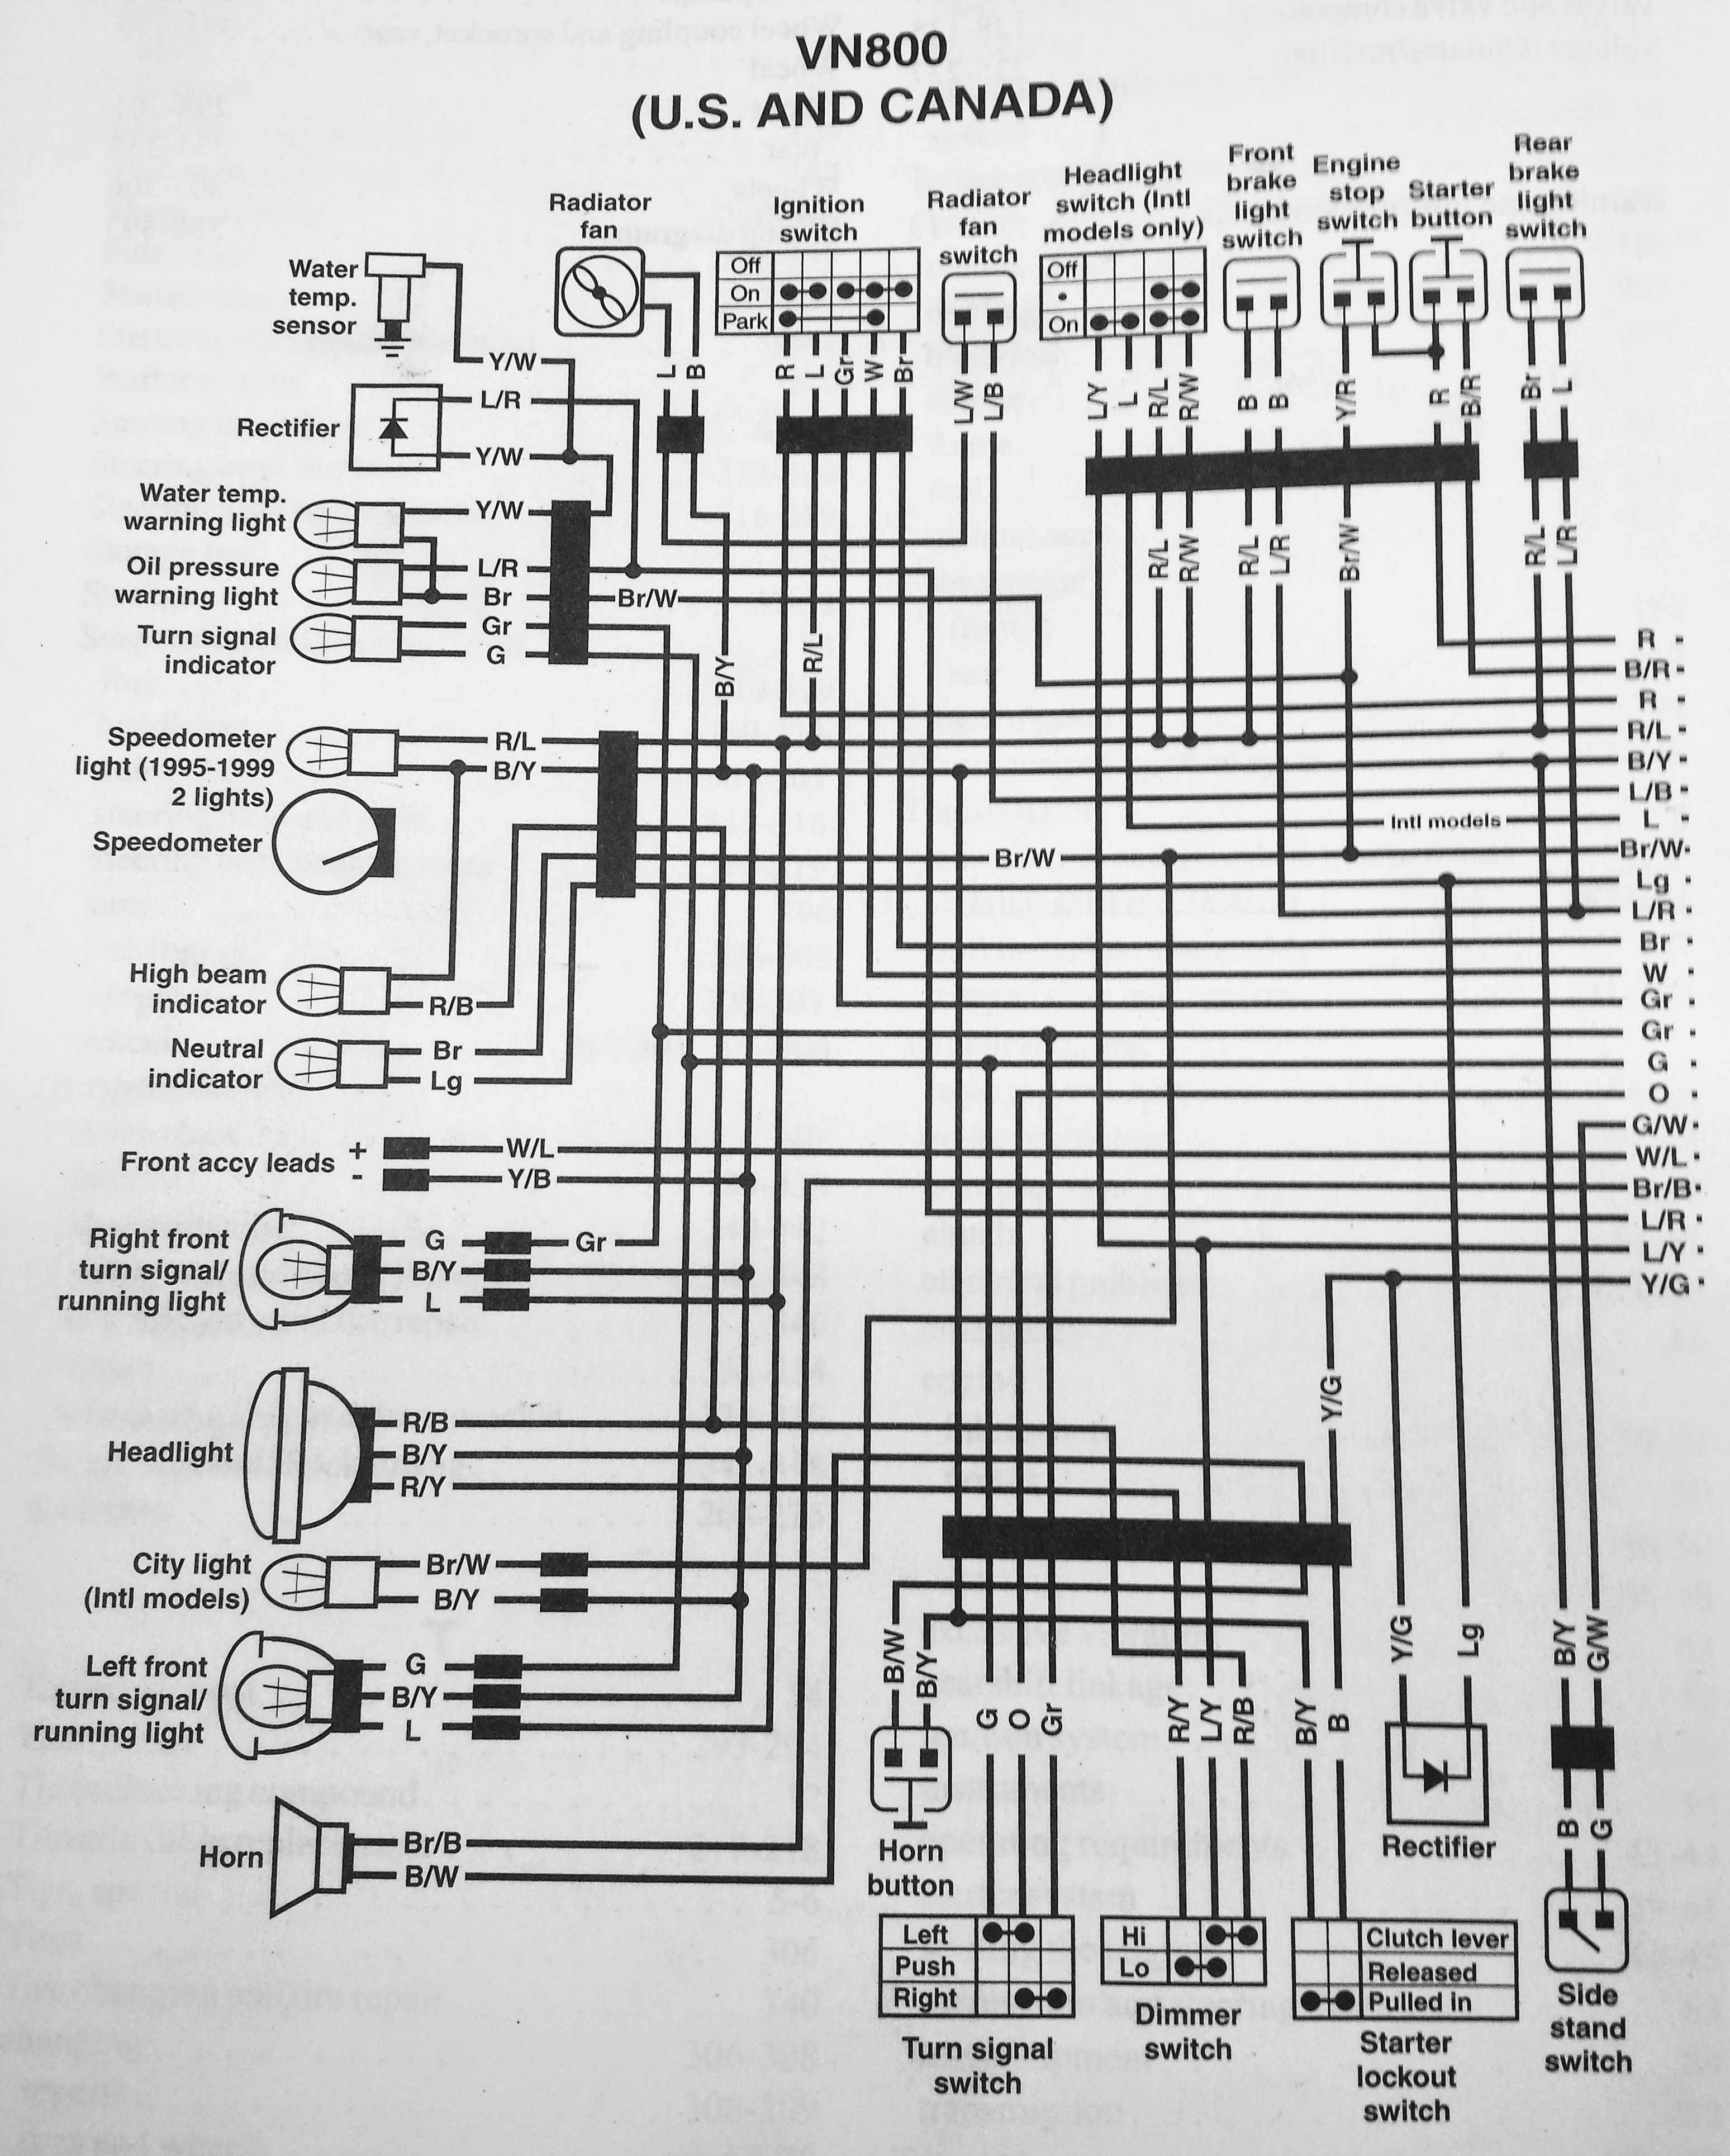 1999 Chevy Tracker Wiring Diagram